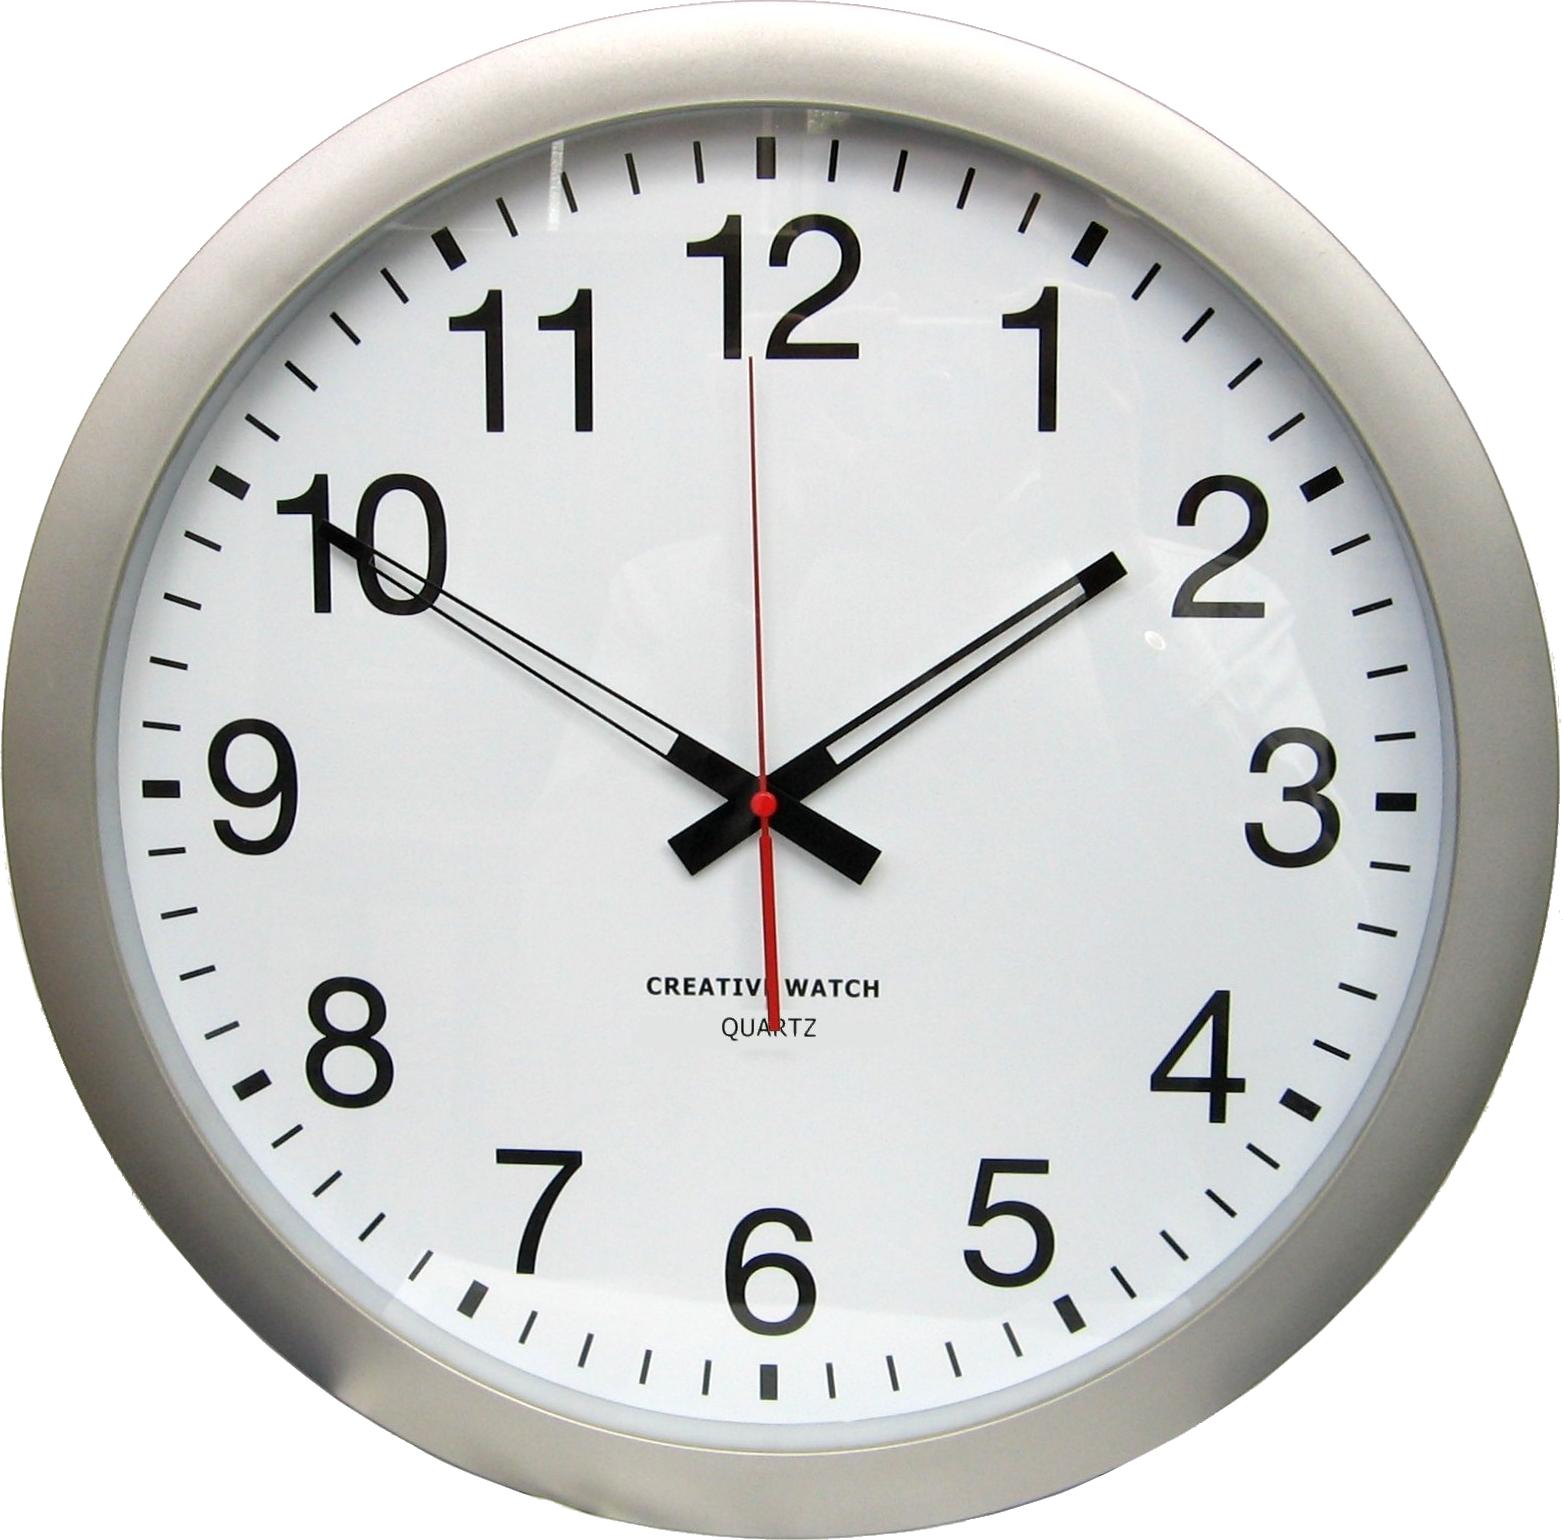 Clock PNG Image - Clock HD PNG